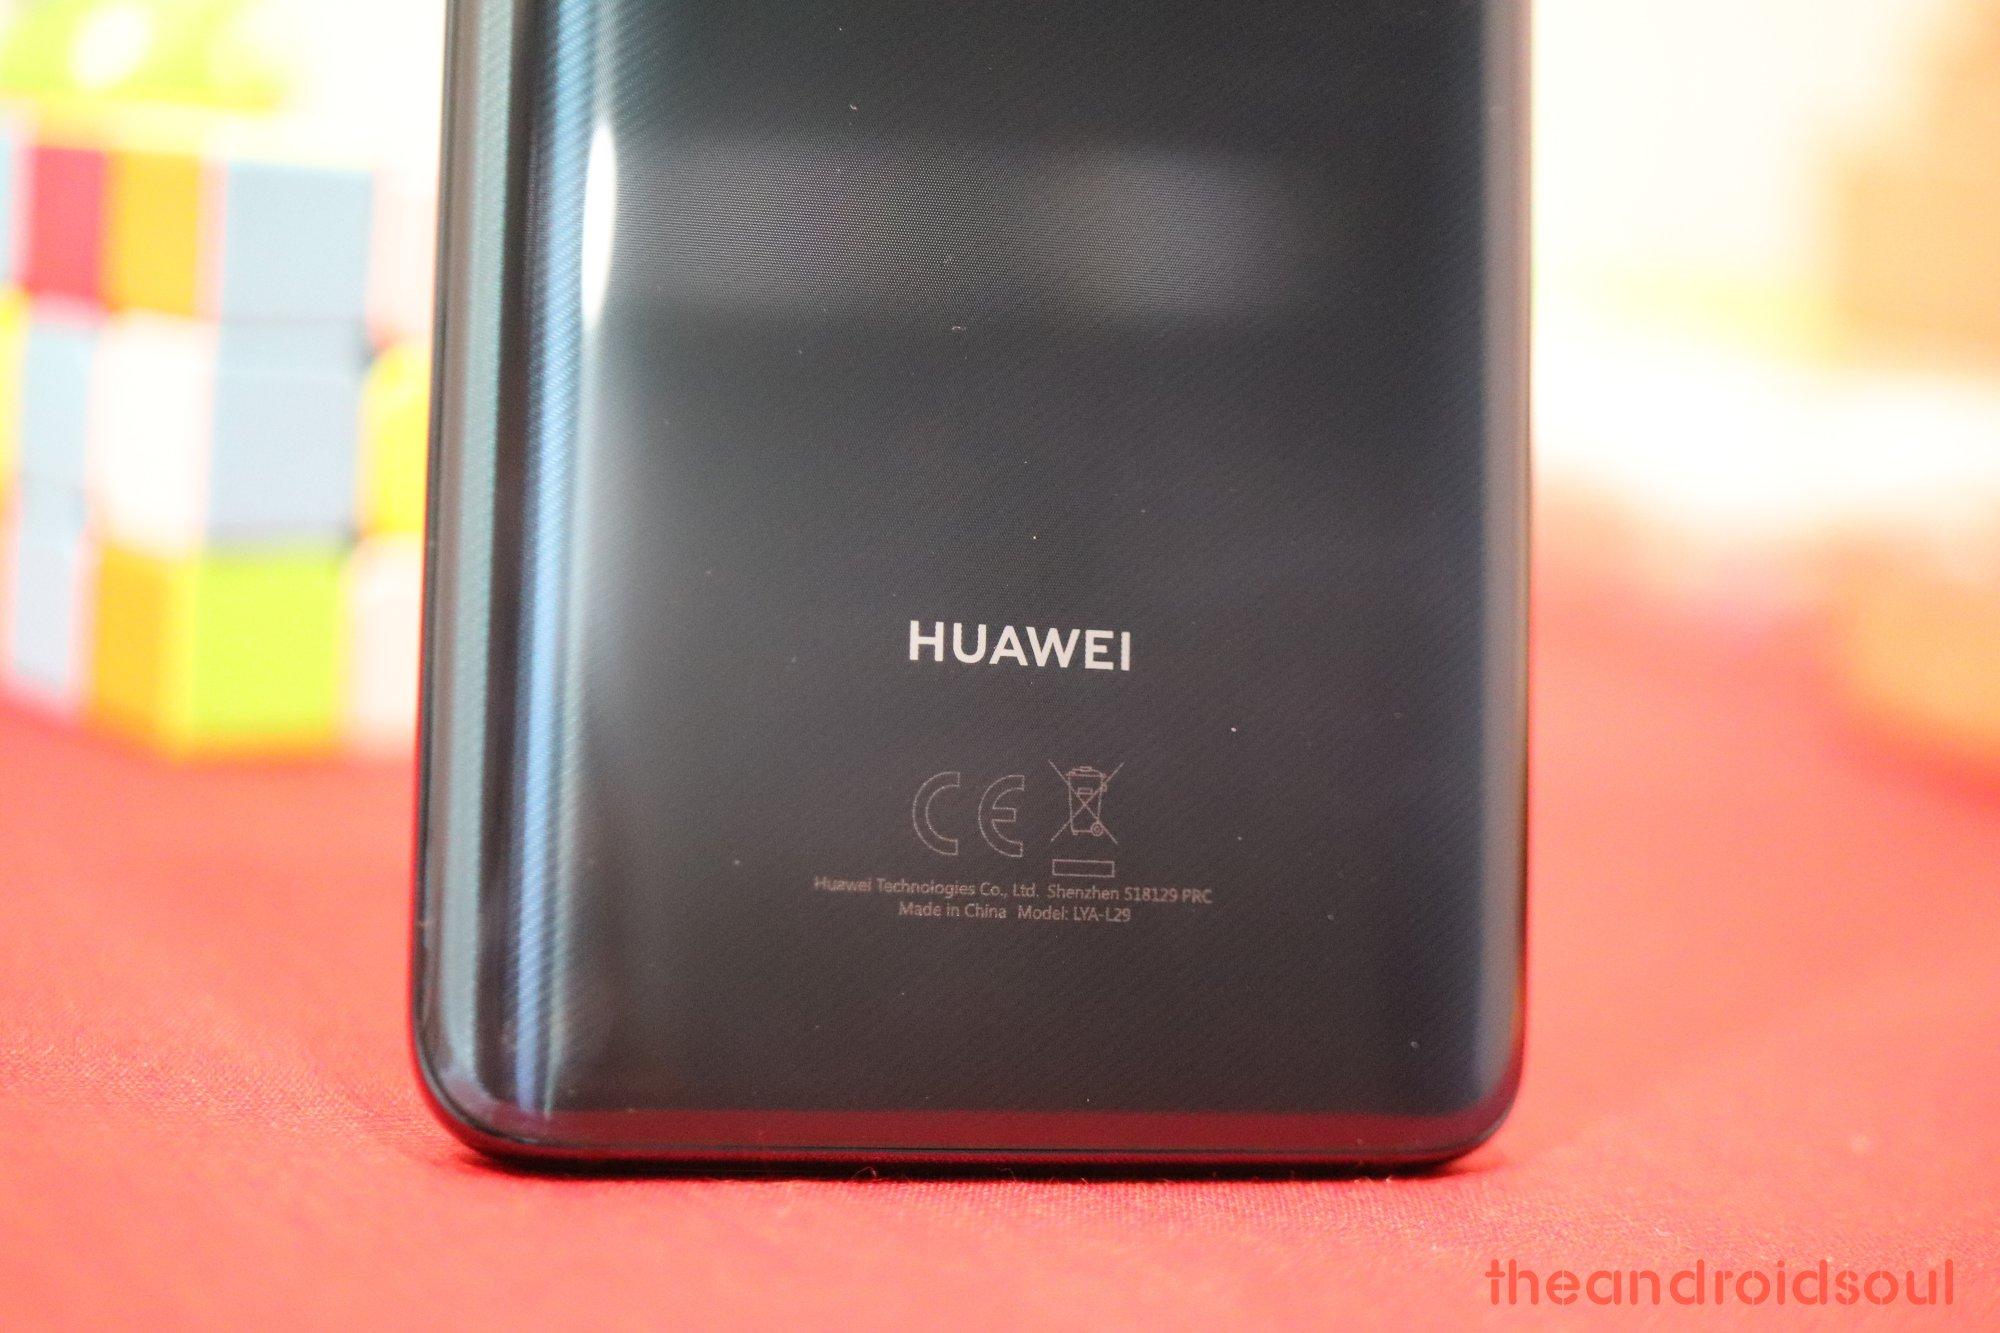 Huawei-Mate-20-Pro-software-update